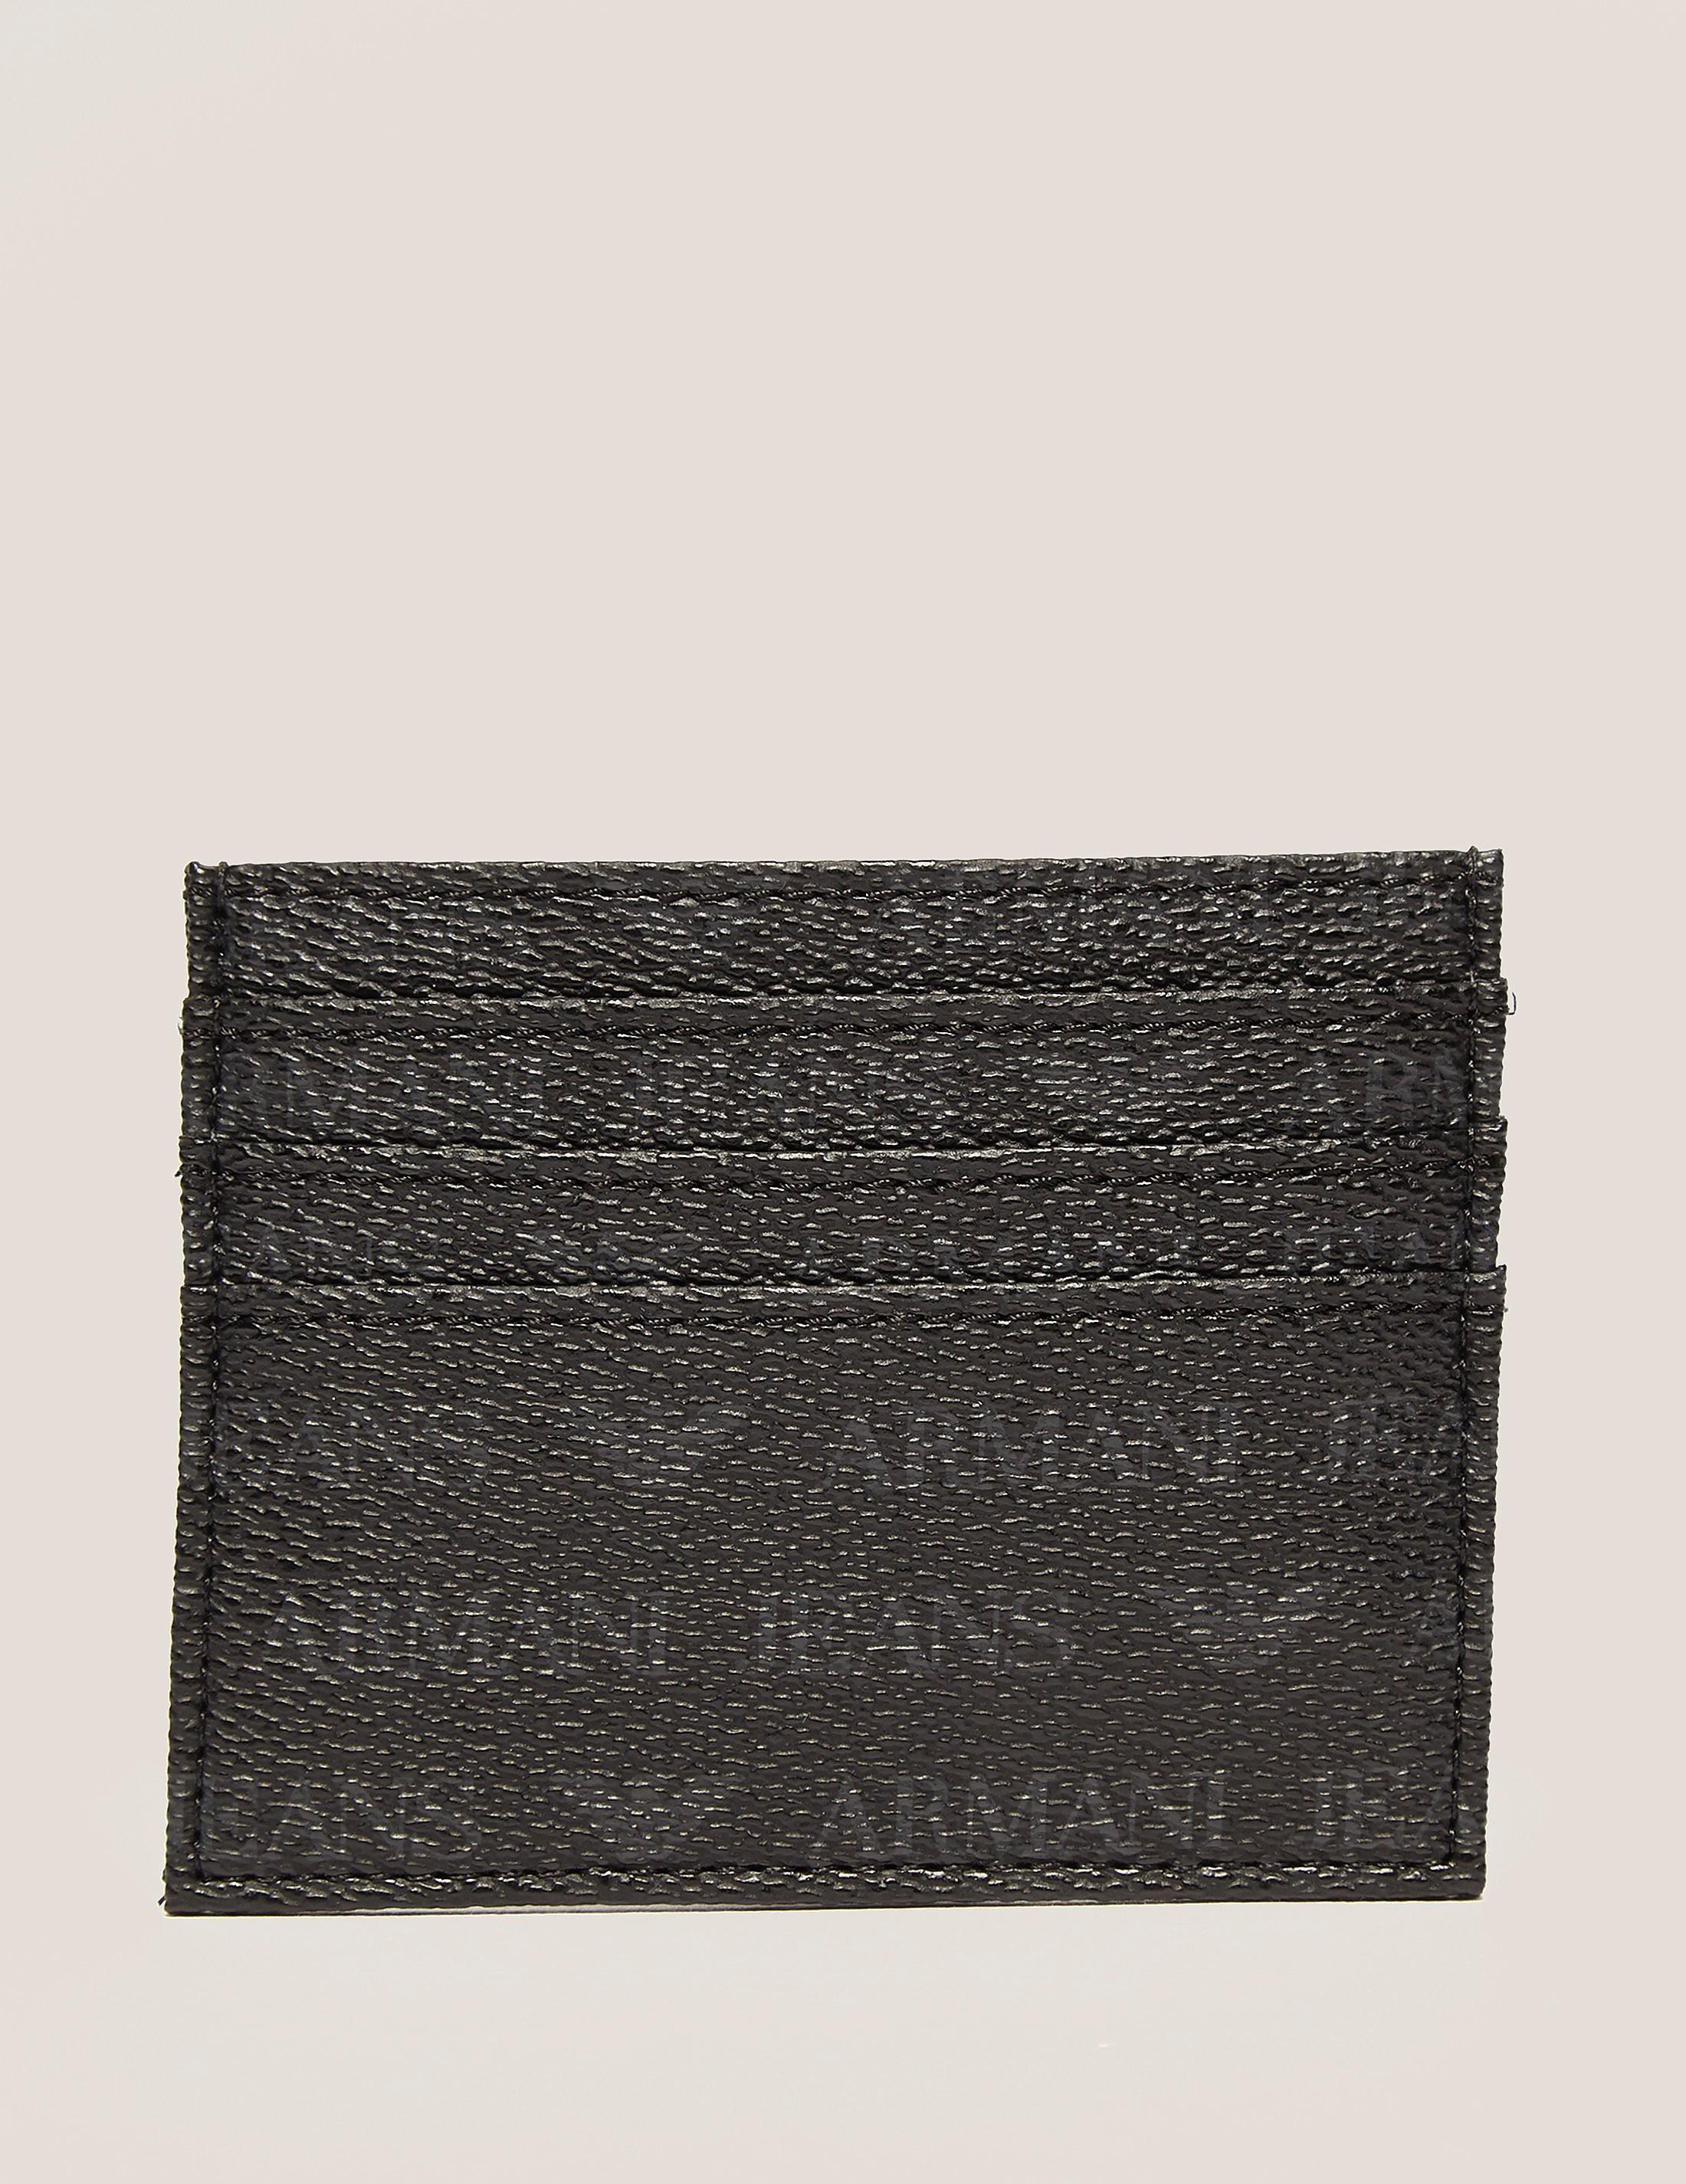 Armani Jeans Logo Print Card Holder